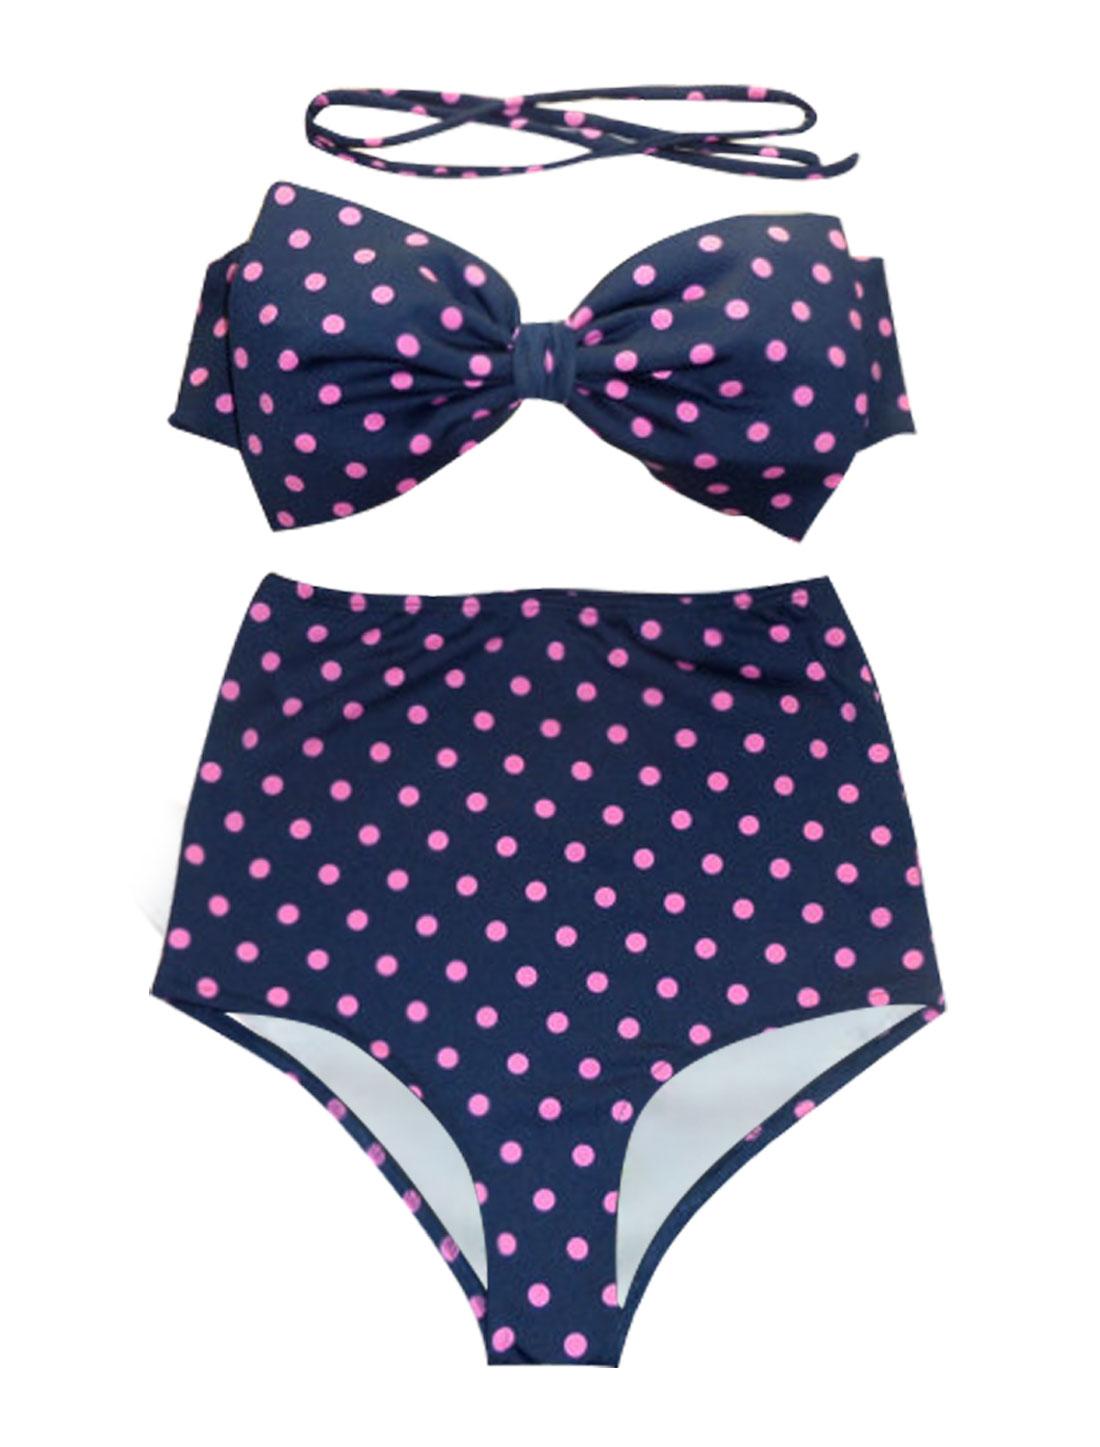 Women Vintage Push-up Padded Bikini Dots High Waist Top Bow Bathing Suit S Navy